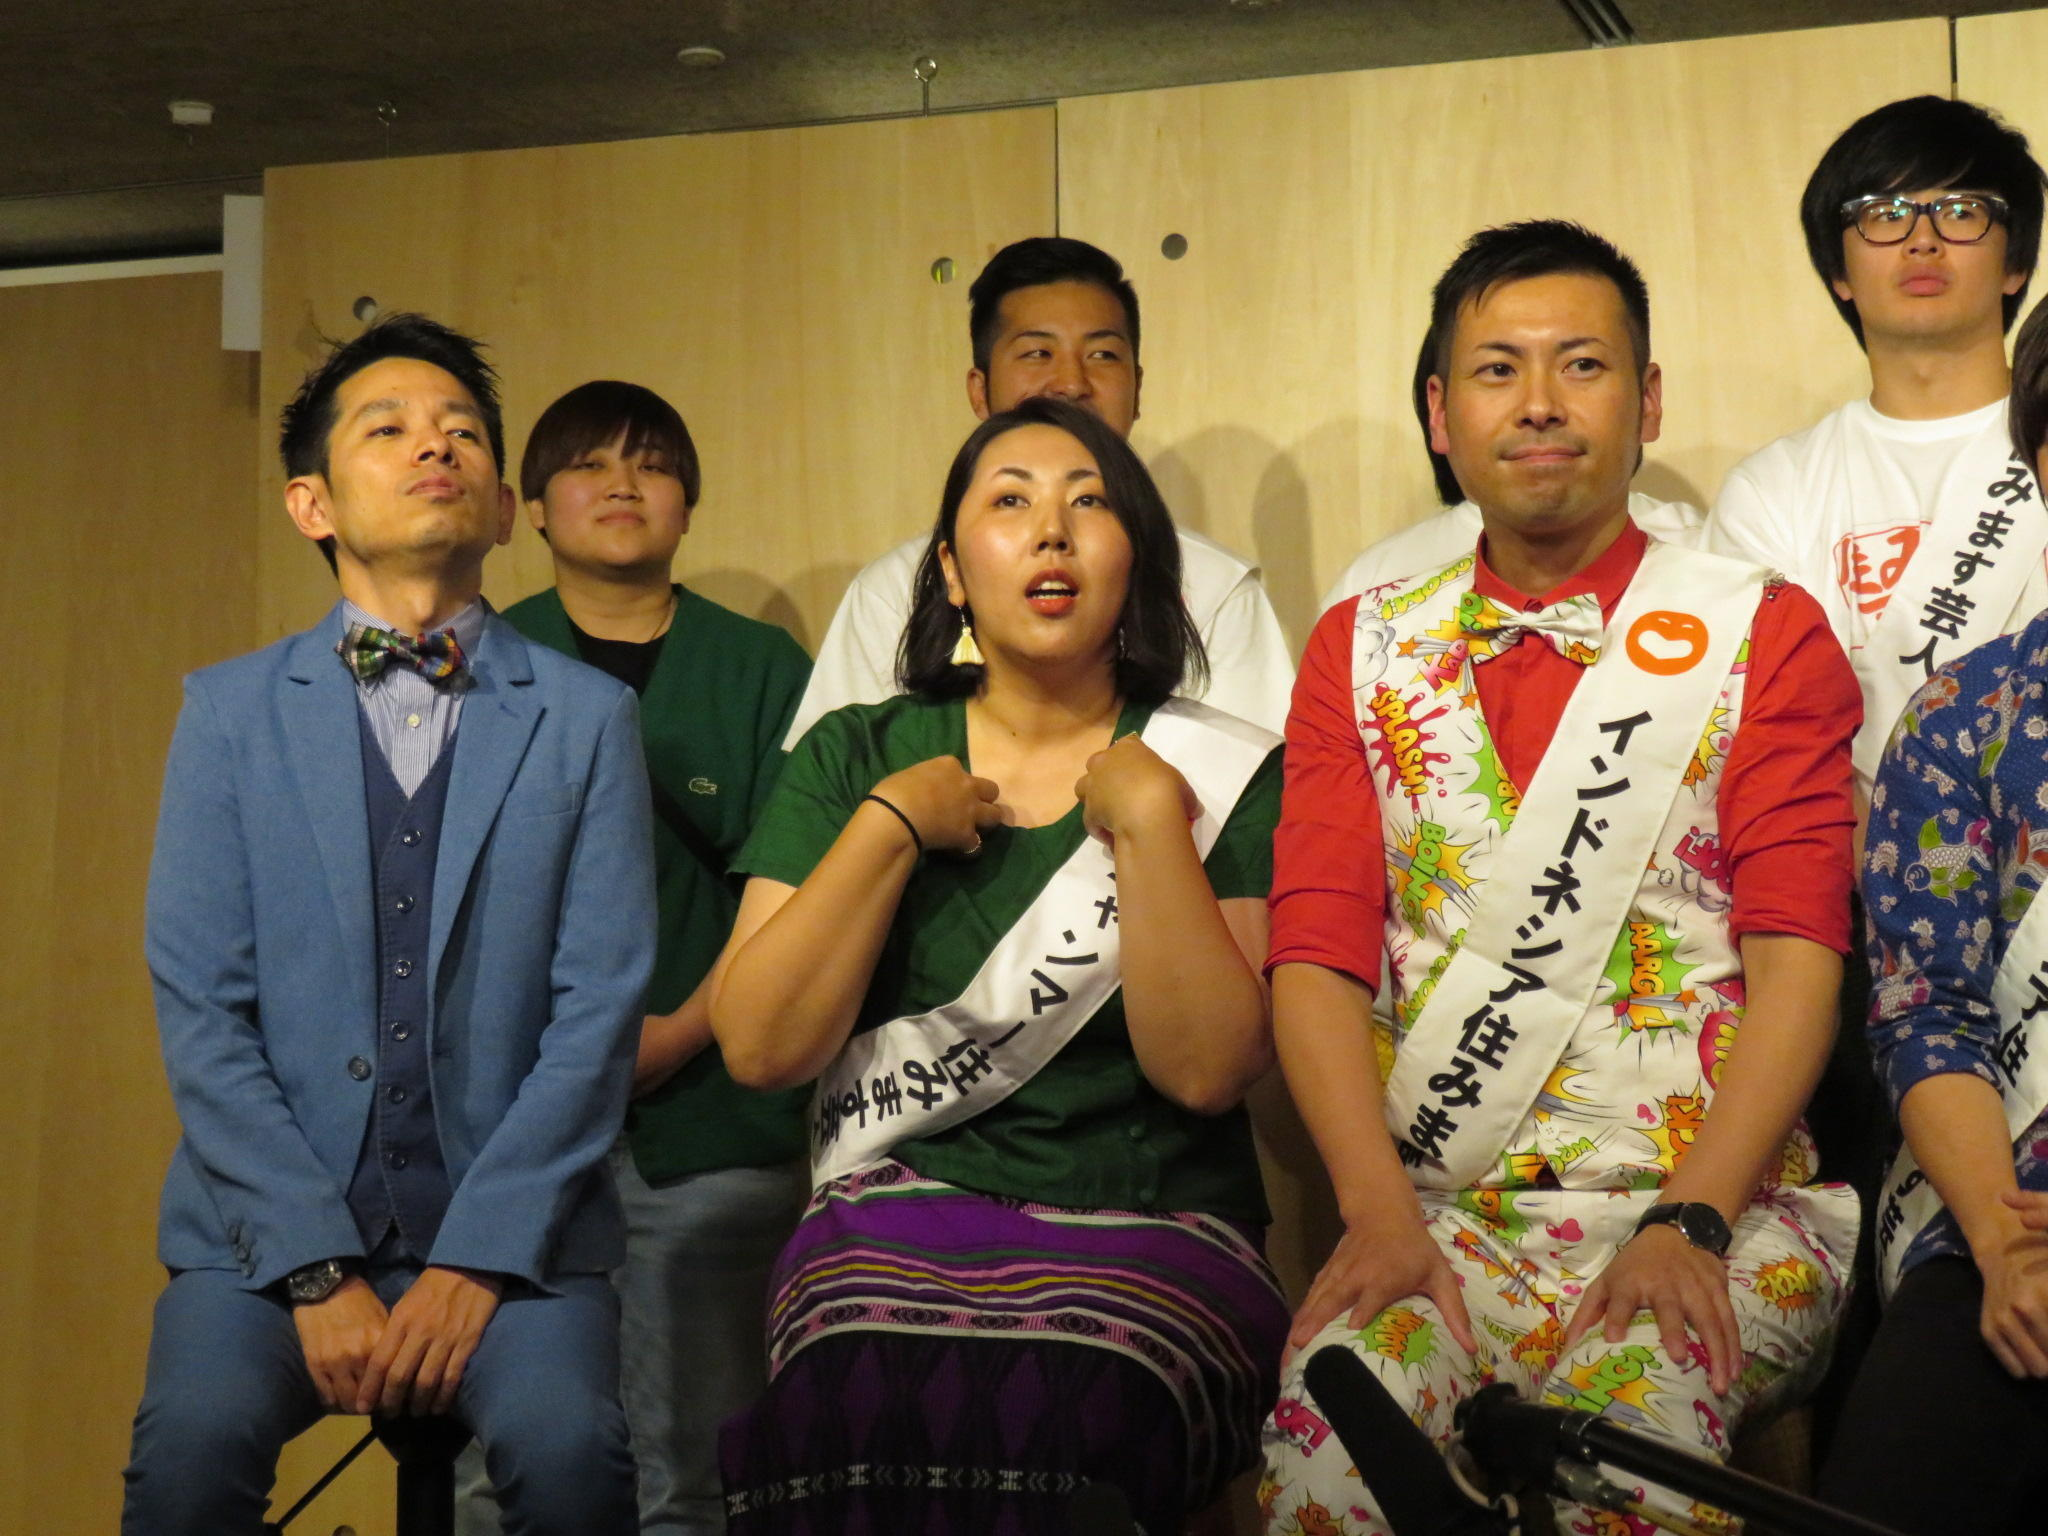 http://news.yoshimoto.co.jp/20181230134735-af1aceb382f2ec919dc1cec468d17c2bef616abc.jpg